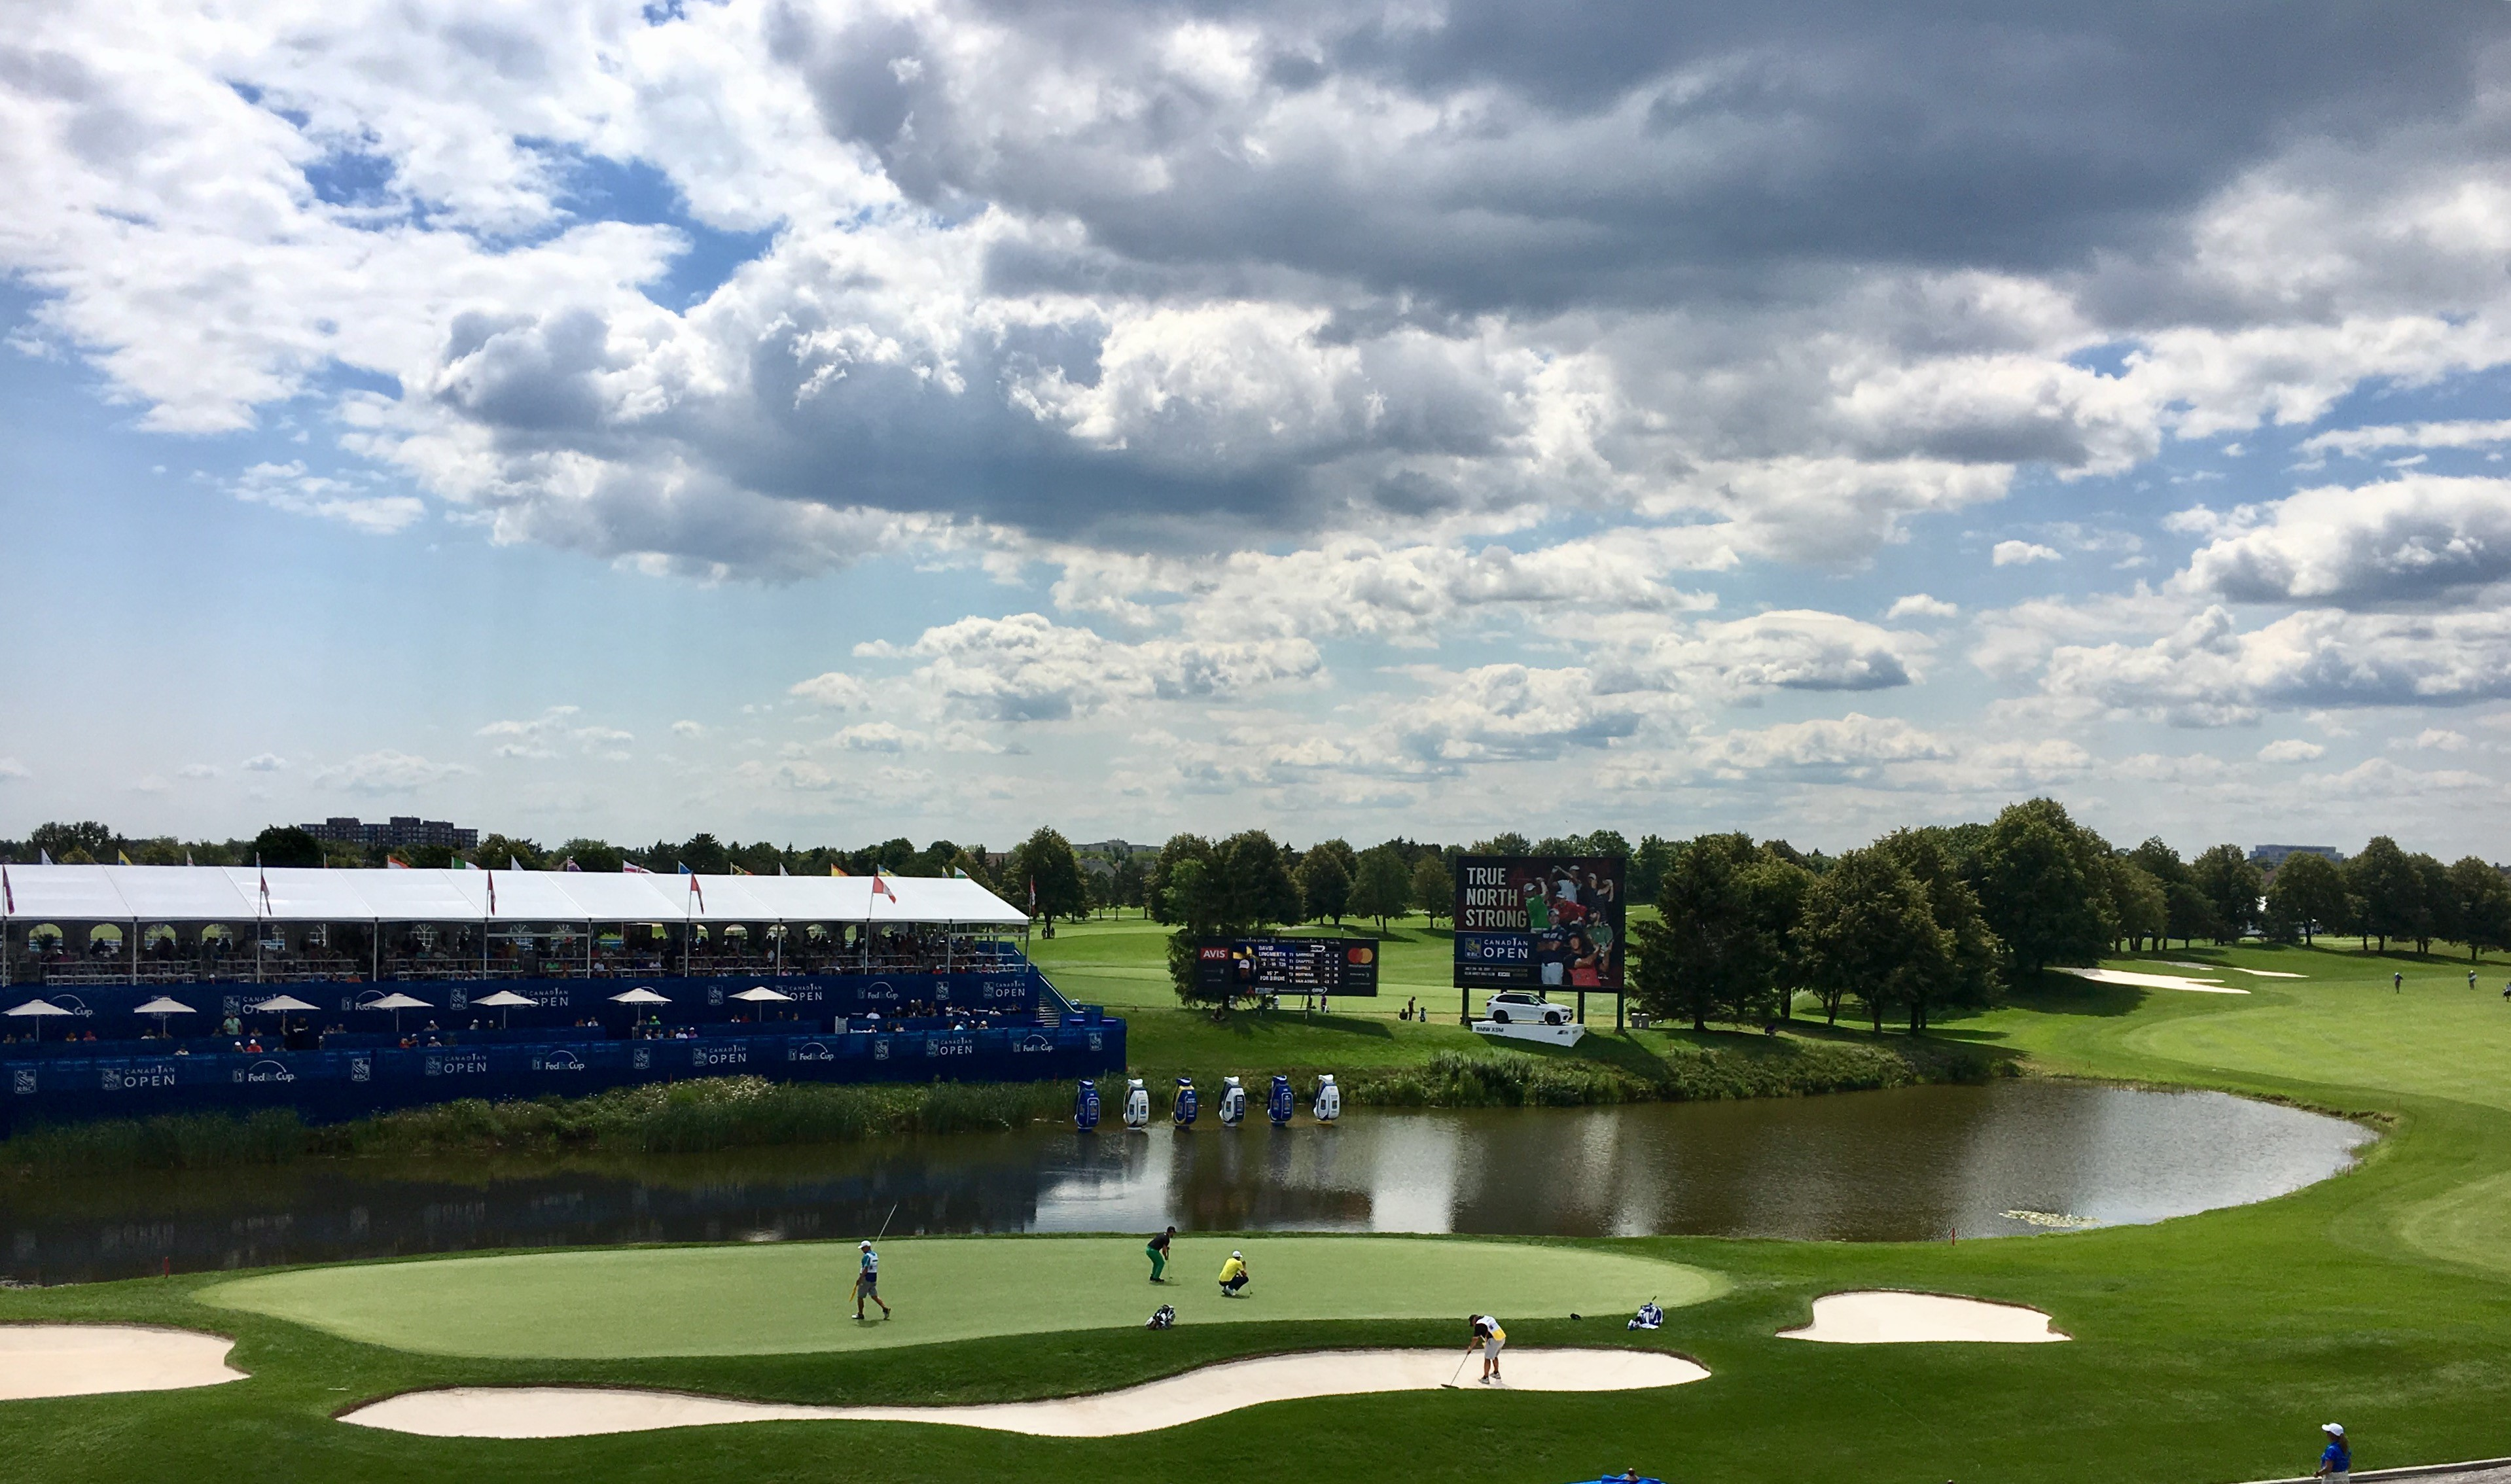 Glen Abbey Golf Course